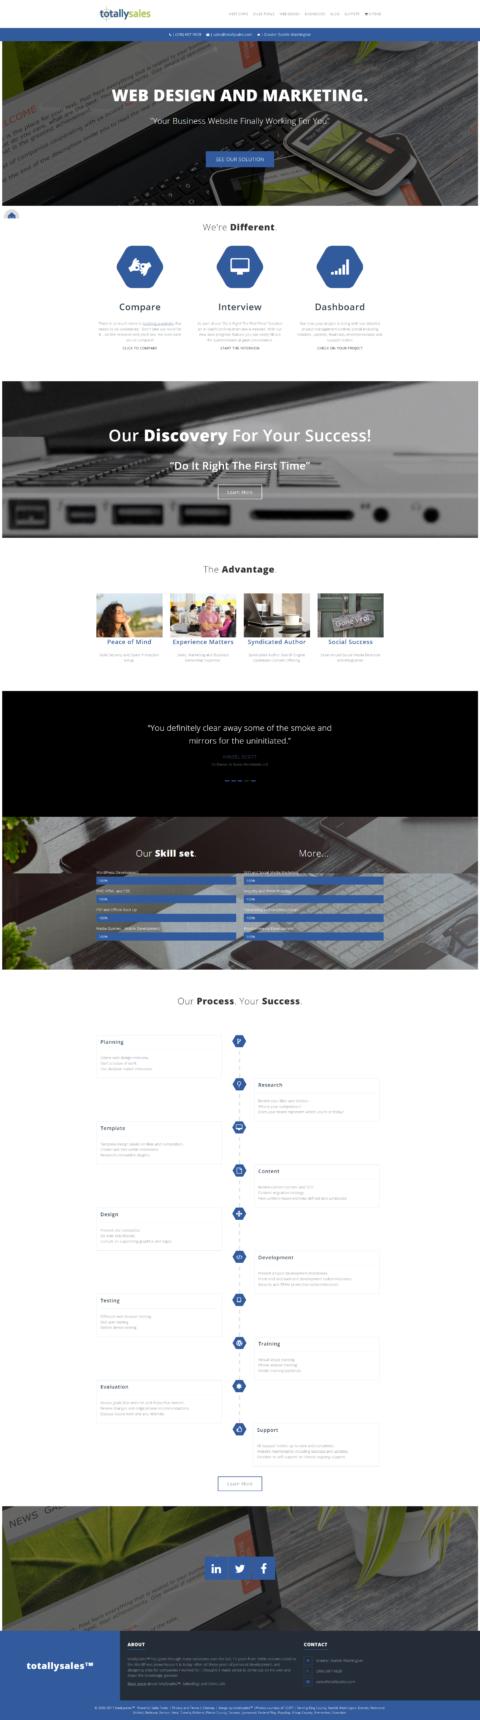 totallysales web design